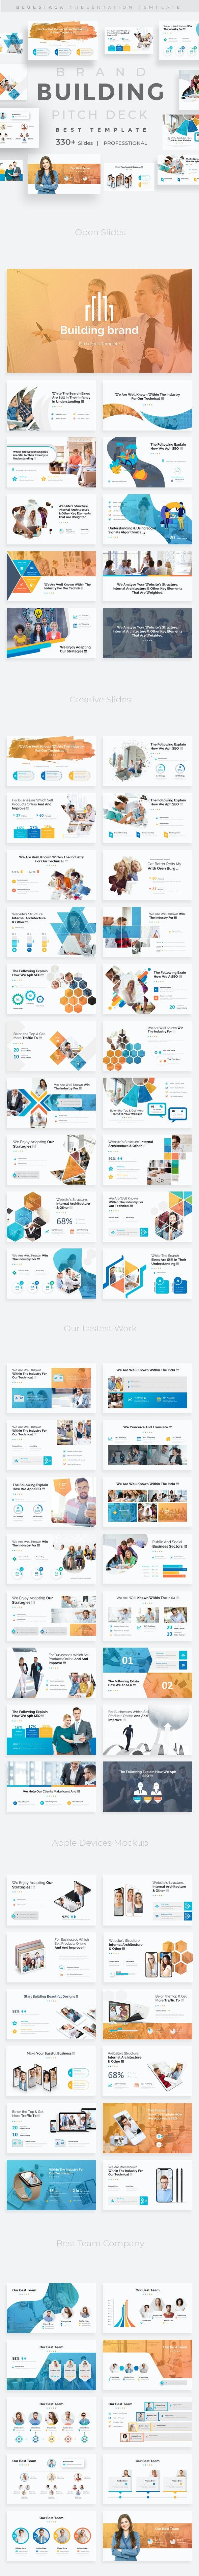 Building Brands Pitch Deck Powerpoint Template - Business PowerPoint Templates